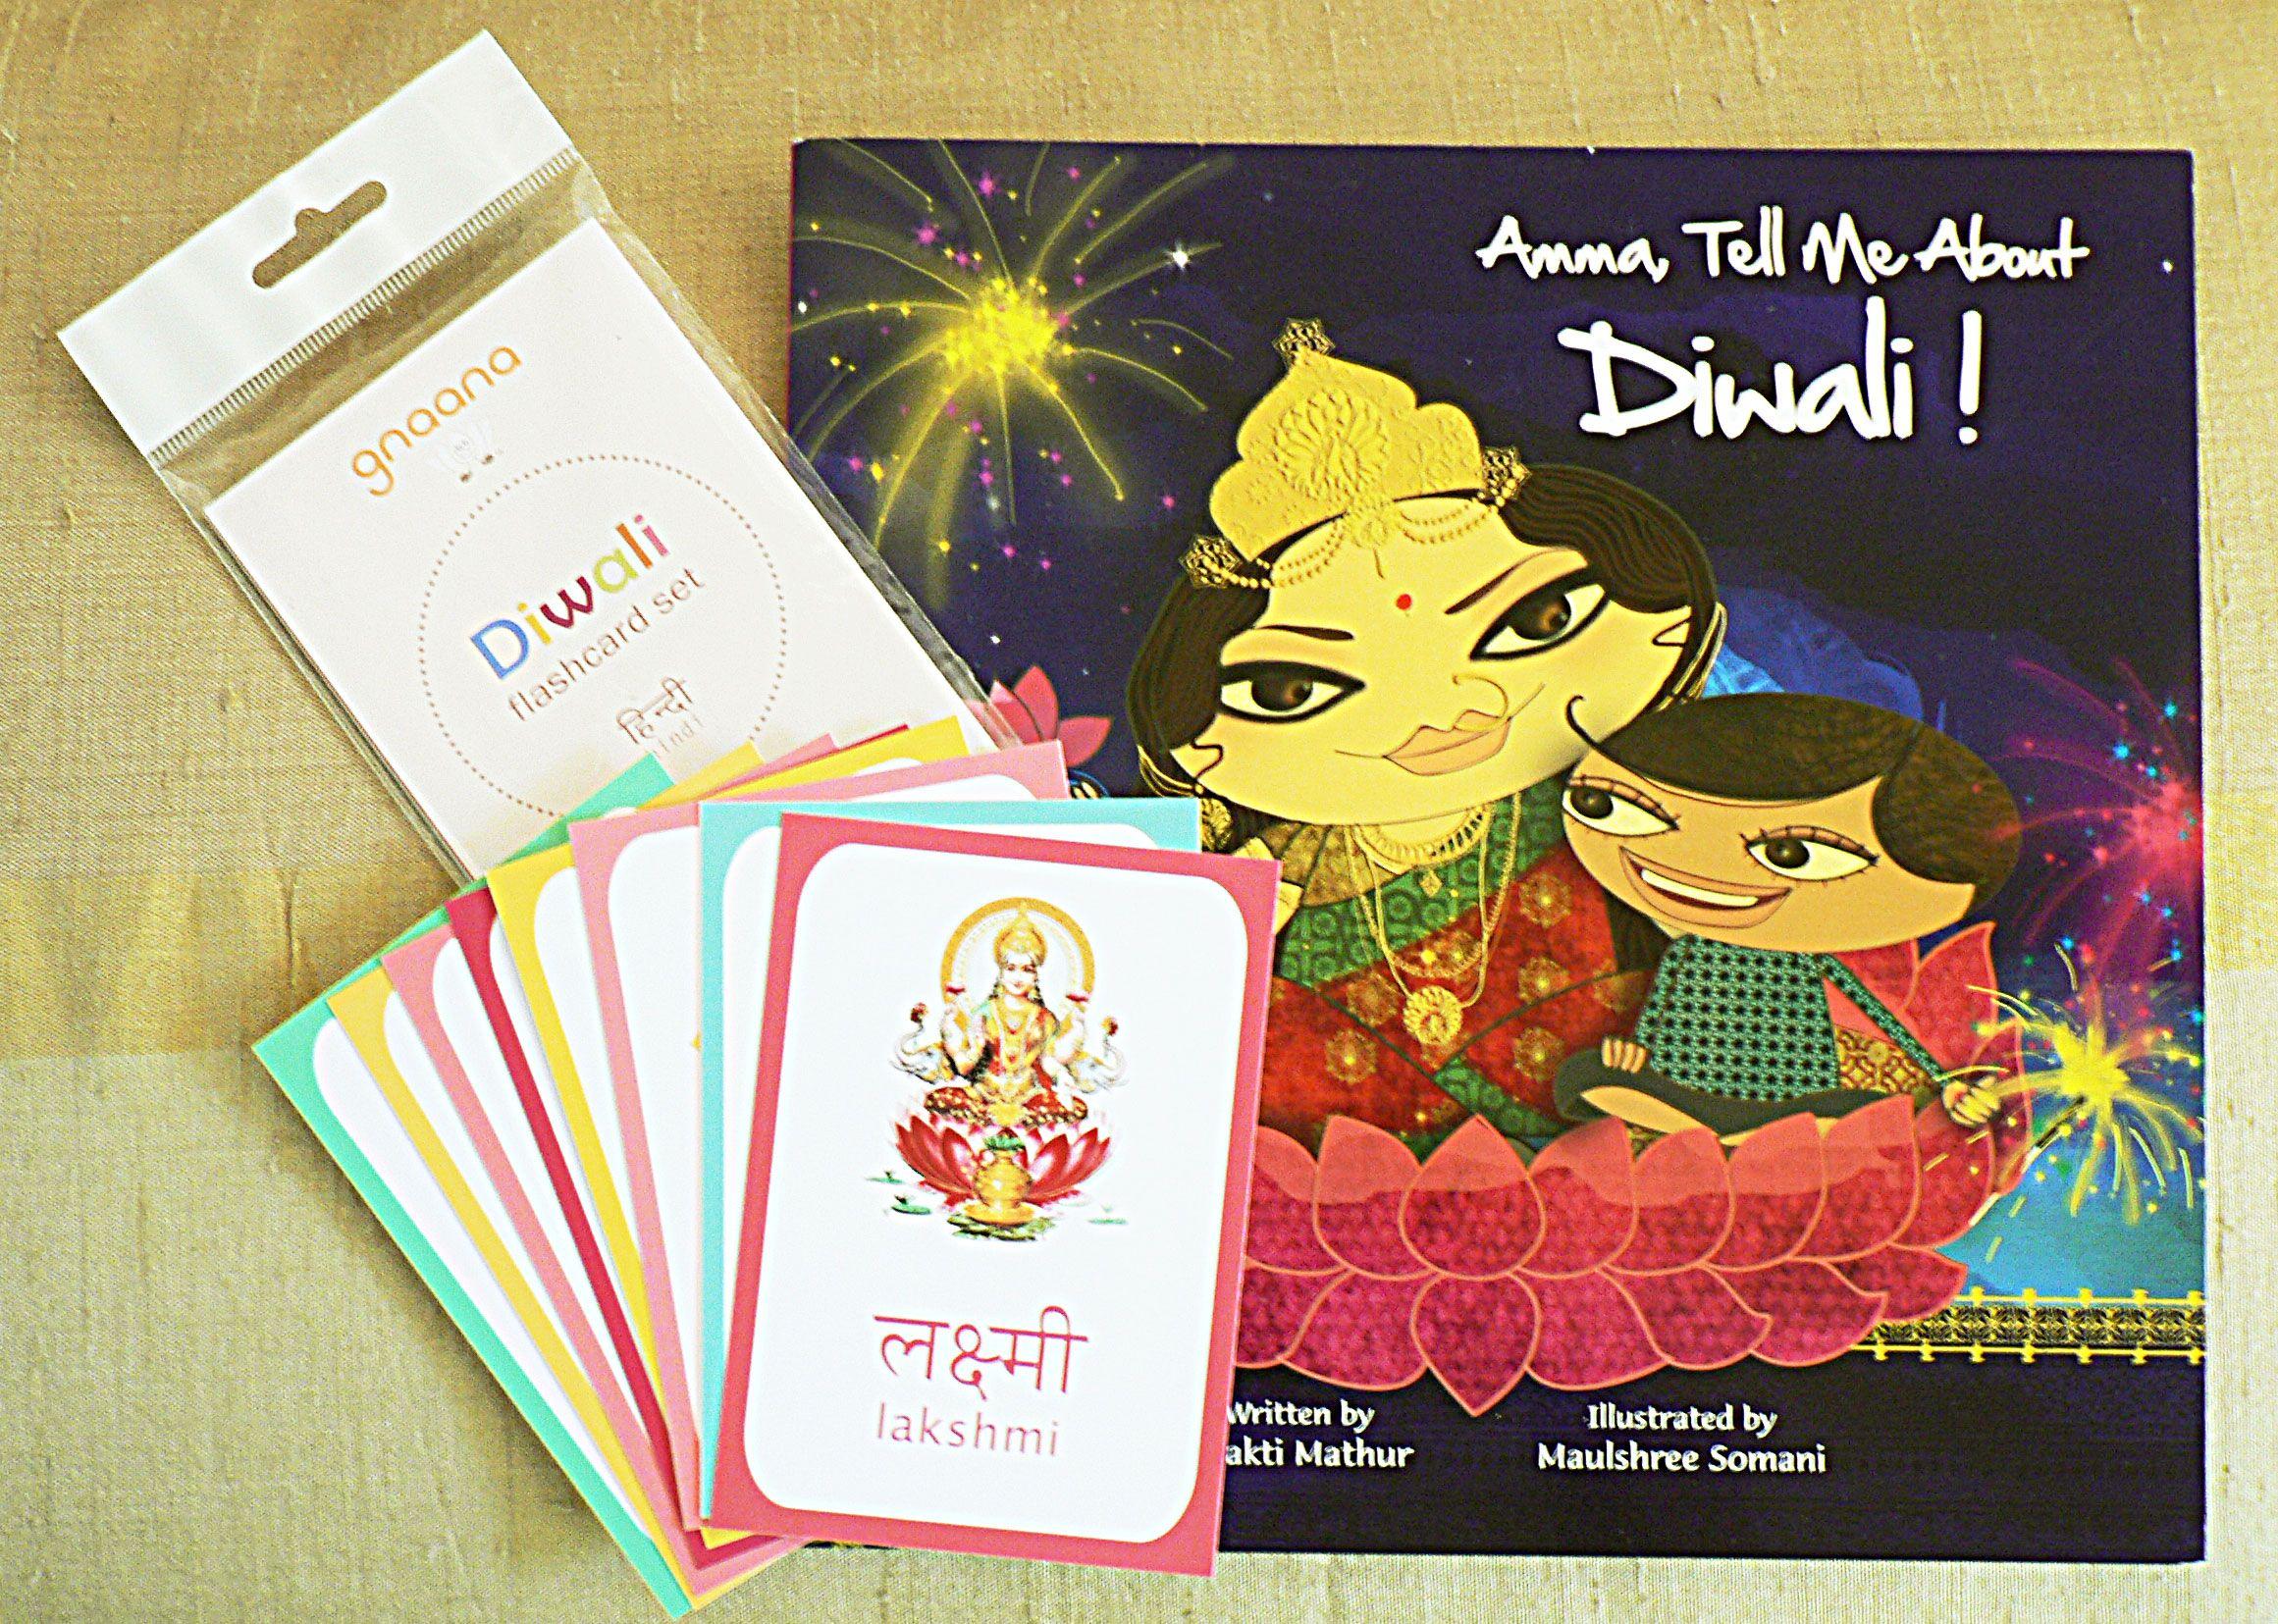 Diwali Kids Book and Flashcard Set | Diwali | Diwali, Best children